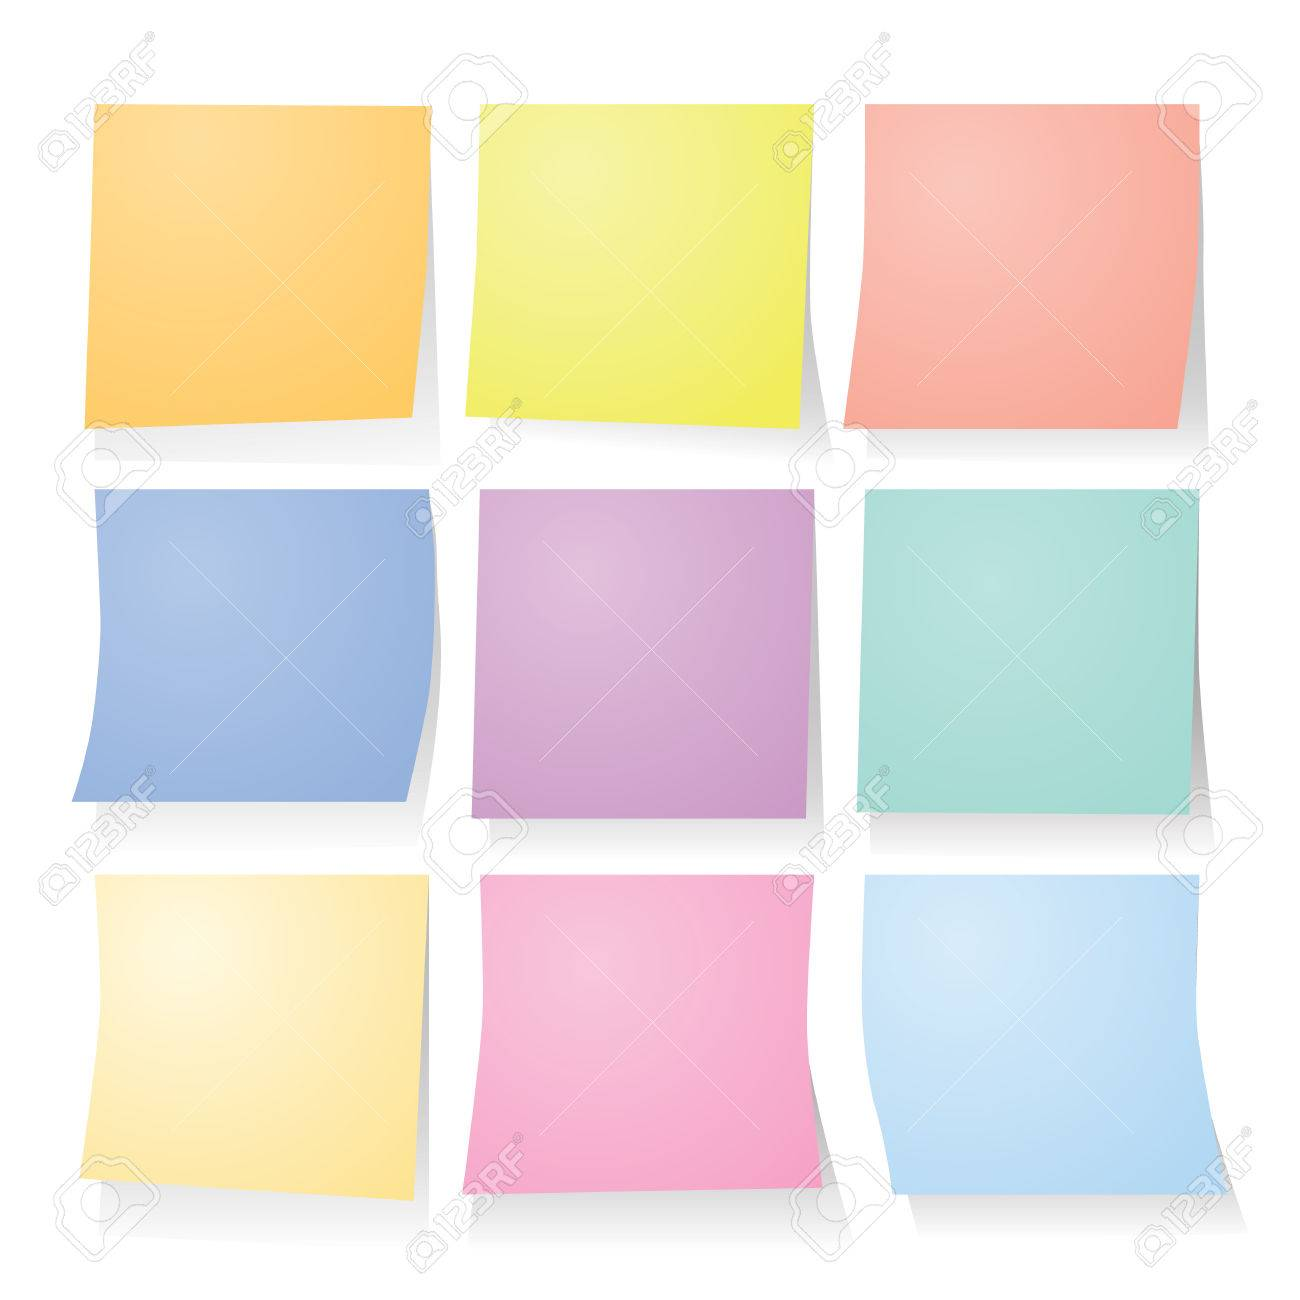 Post It Note clipart - Information, Paper, Yellow, transparent clip art